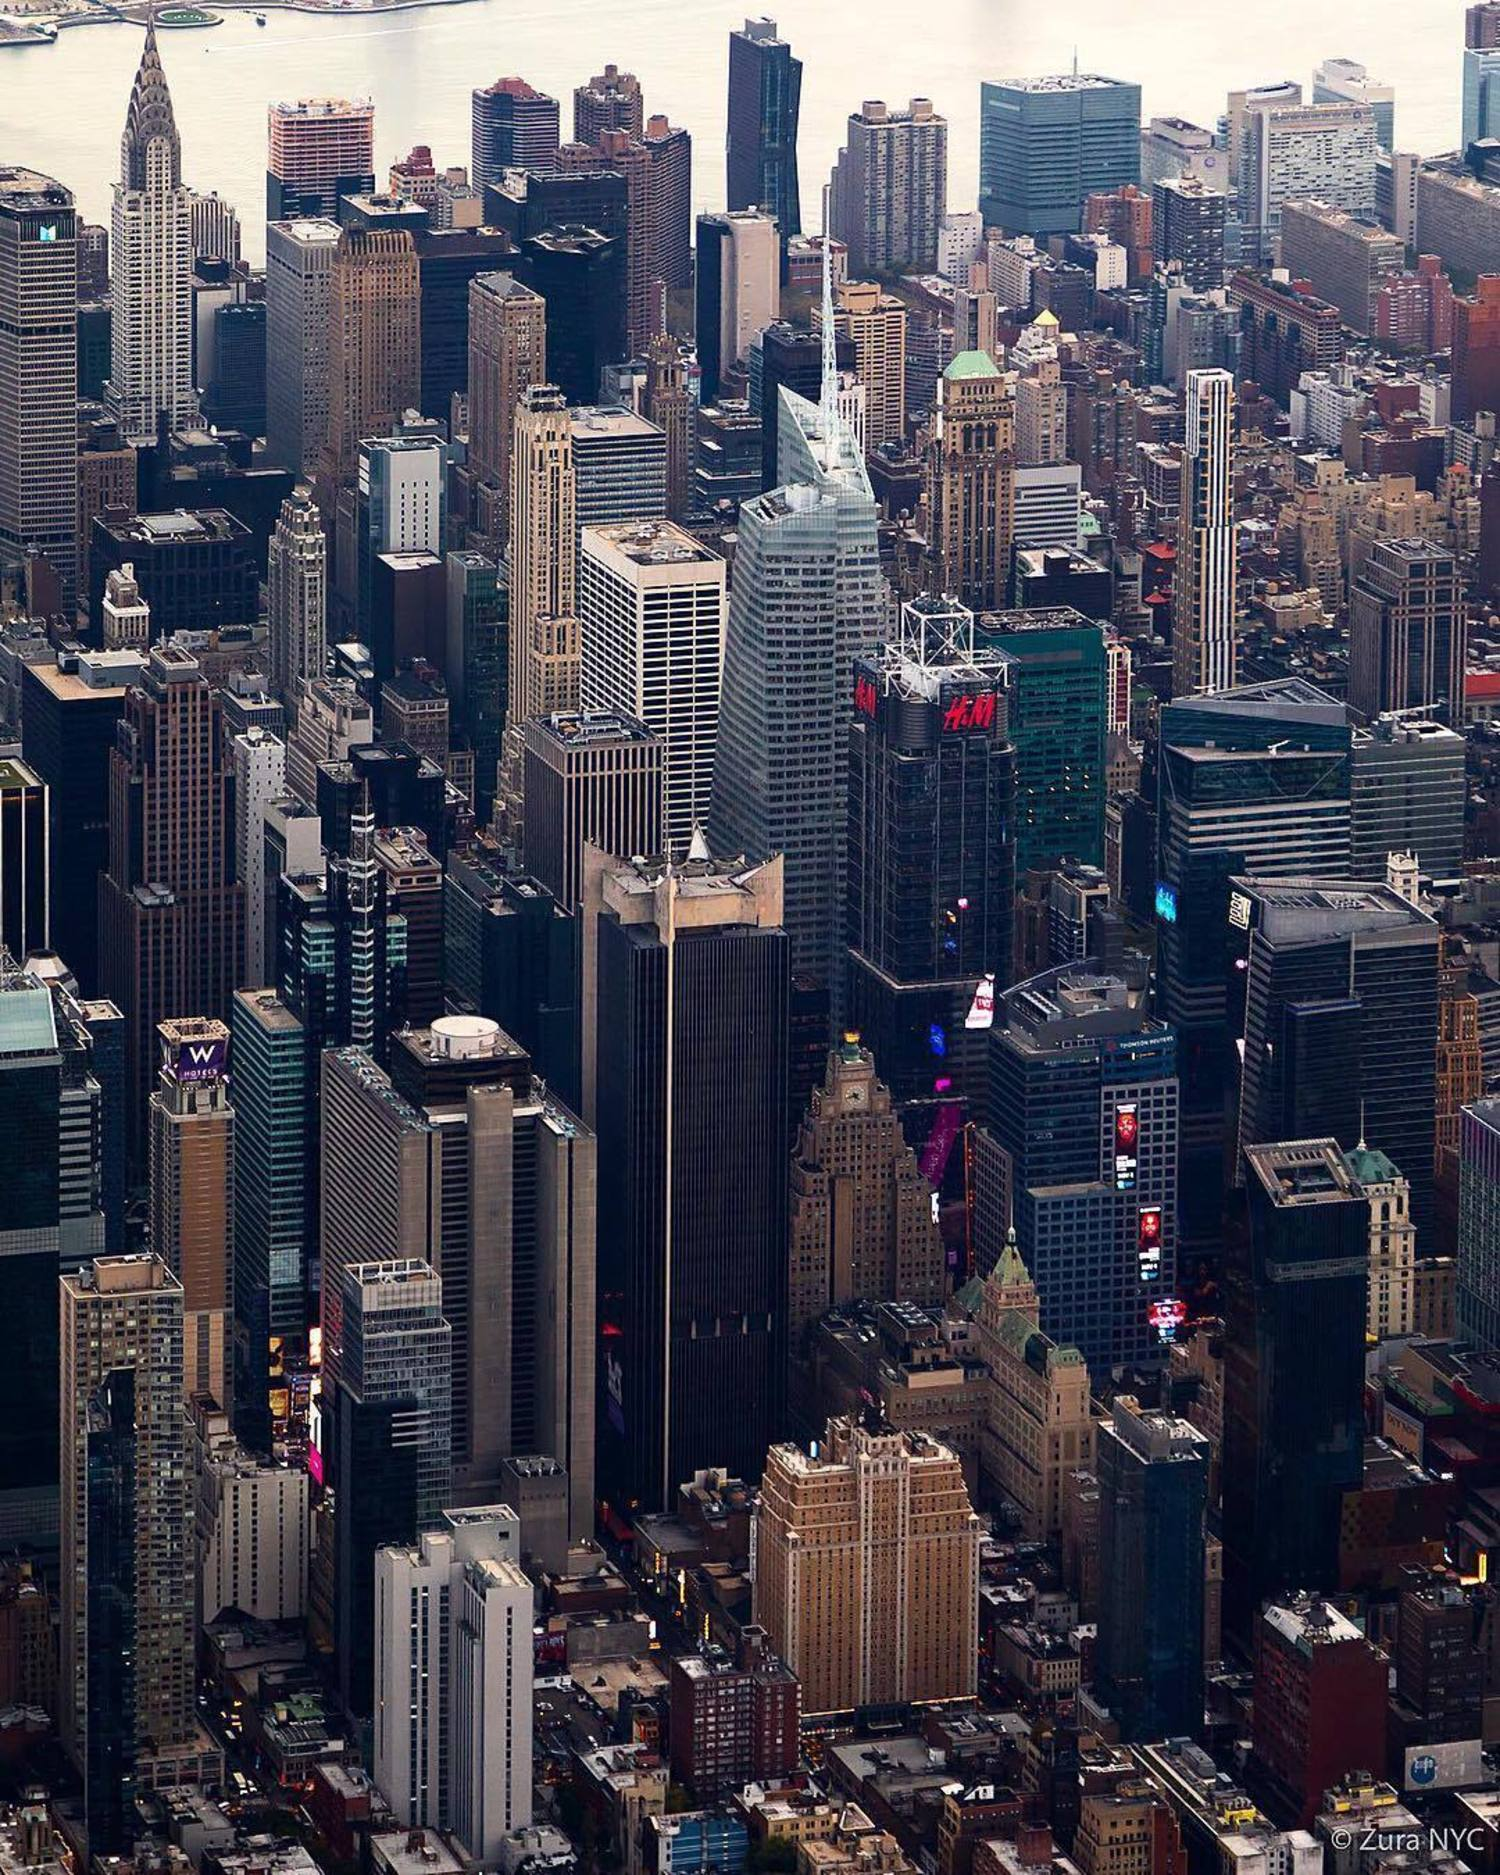 New York, New York. Photo via @zura.nyc #viewingnyc #newyork #newyorkcity #nyc